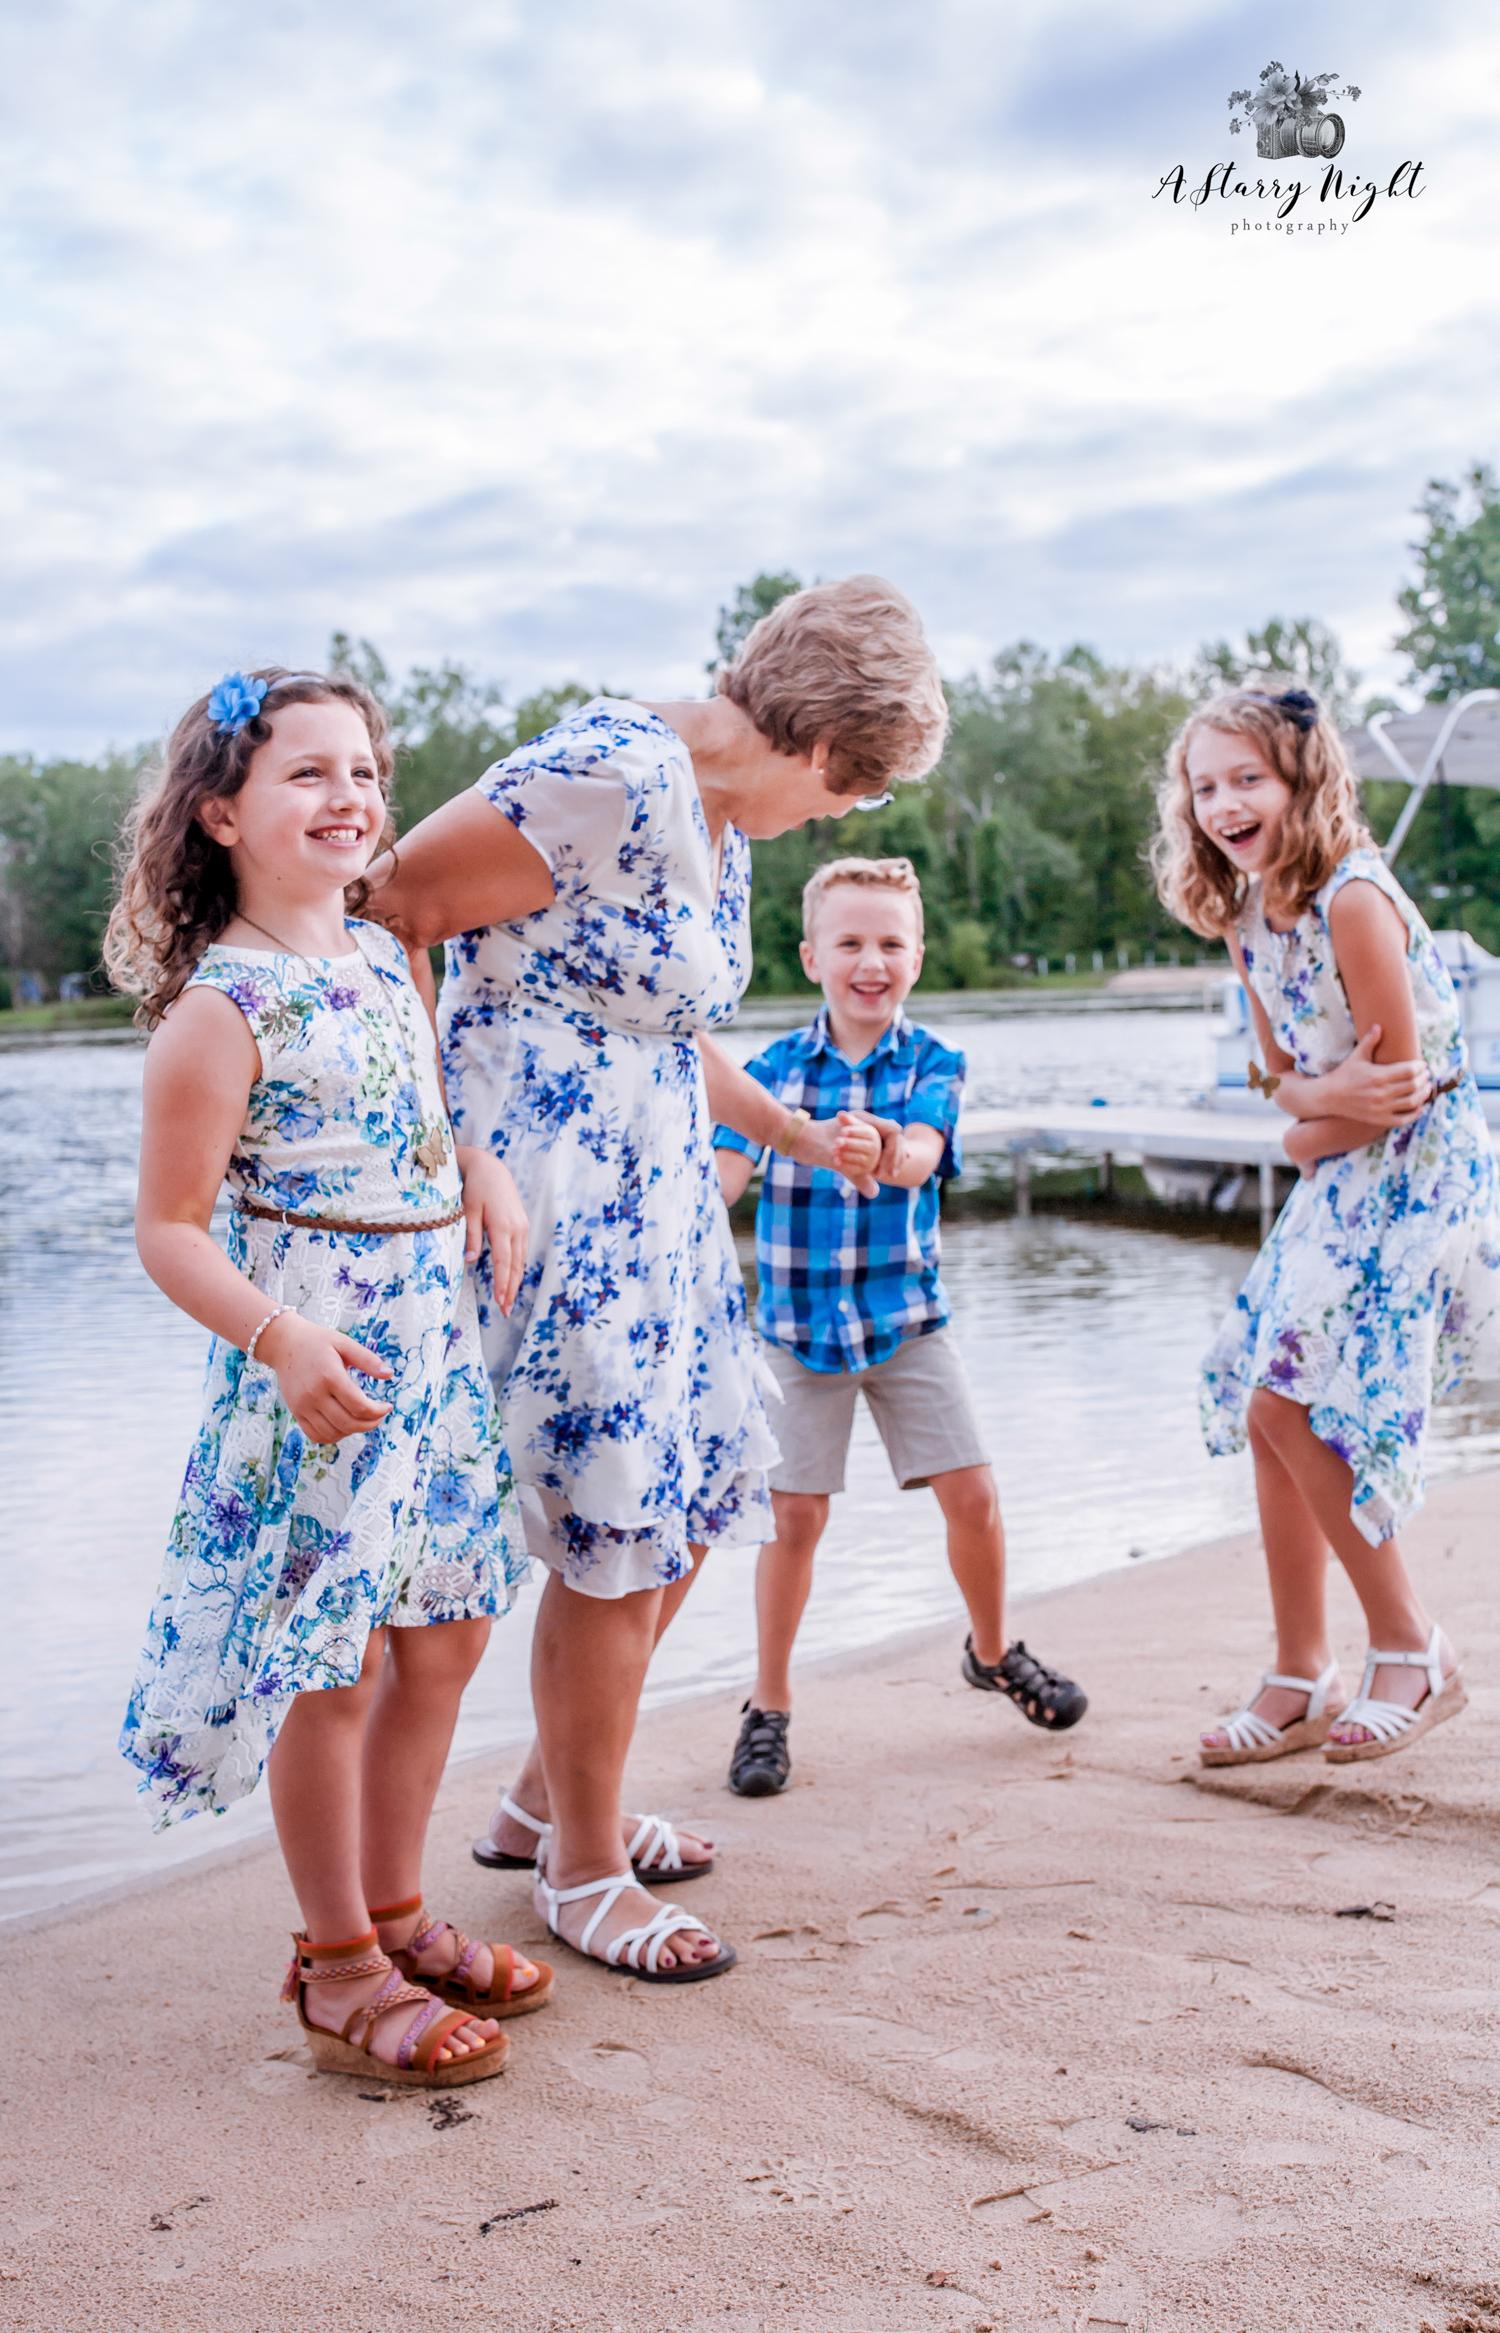 Midland-Michigan-Family-Portrait-Lifestyle.jpg